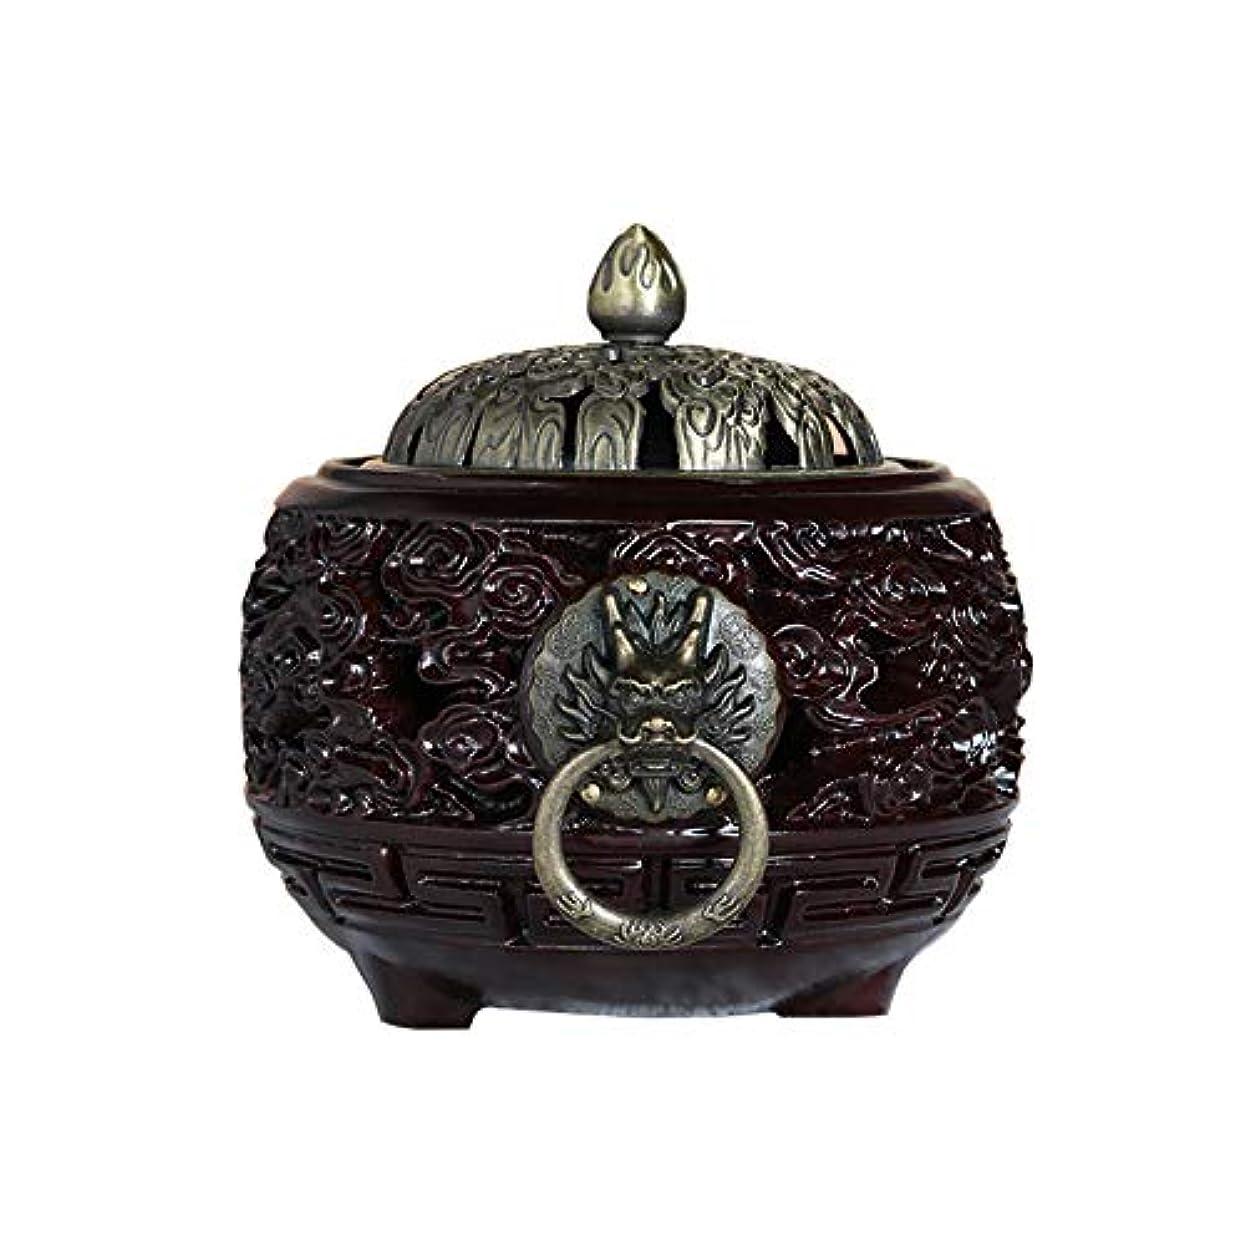 PHILOGOD 線香立て マホガニーメタルカバーエンボス仏壇用香炉 香皿/お香 ホルダー 香置物